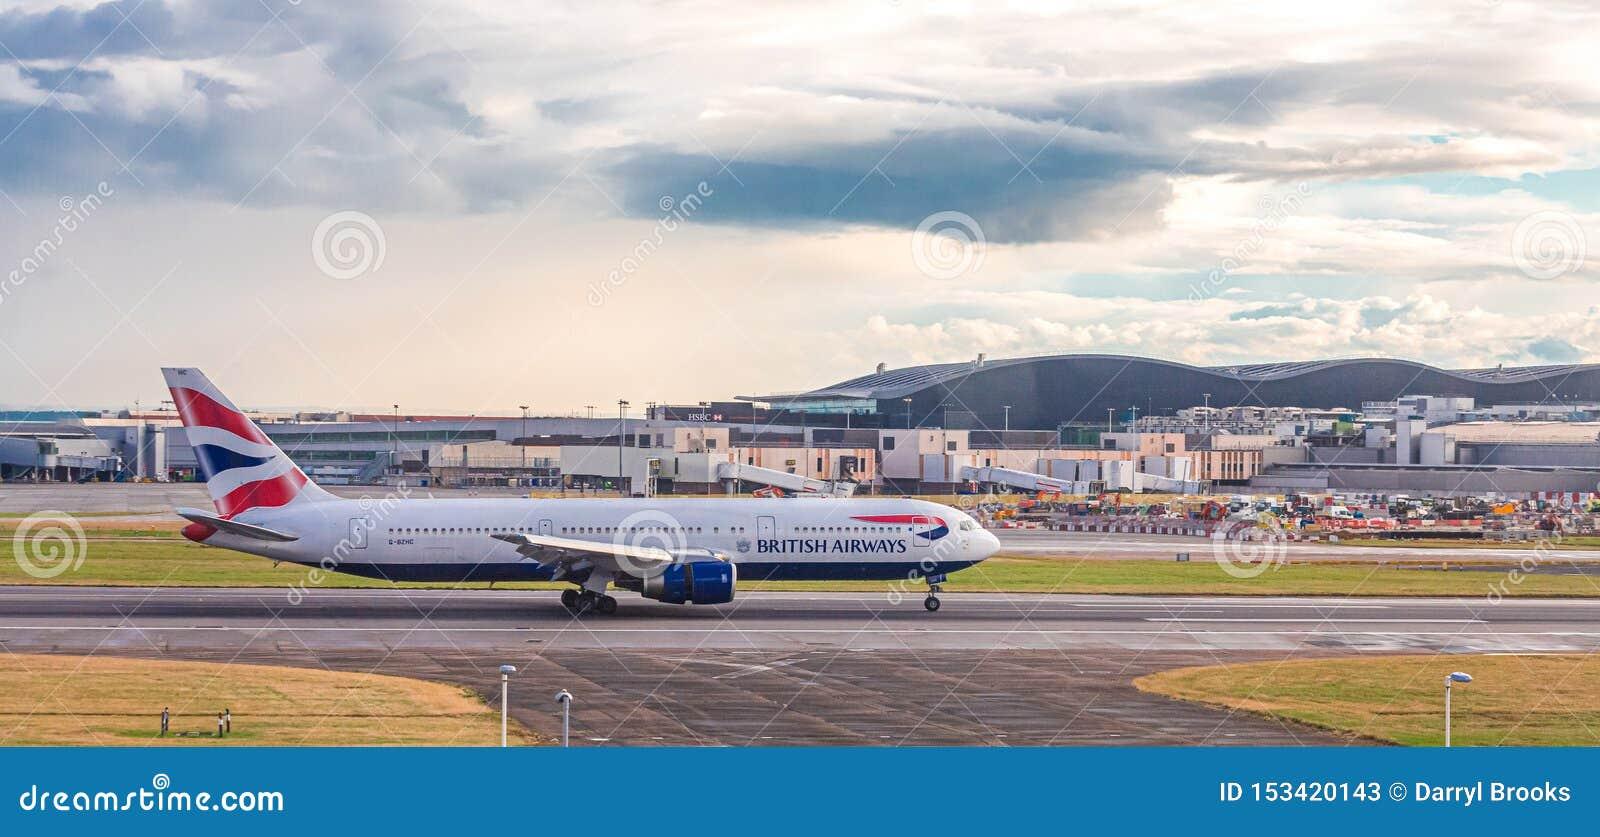 British Airways on Taxiway